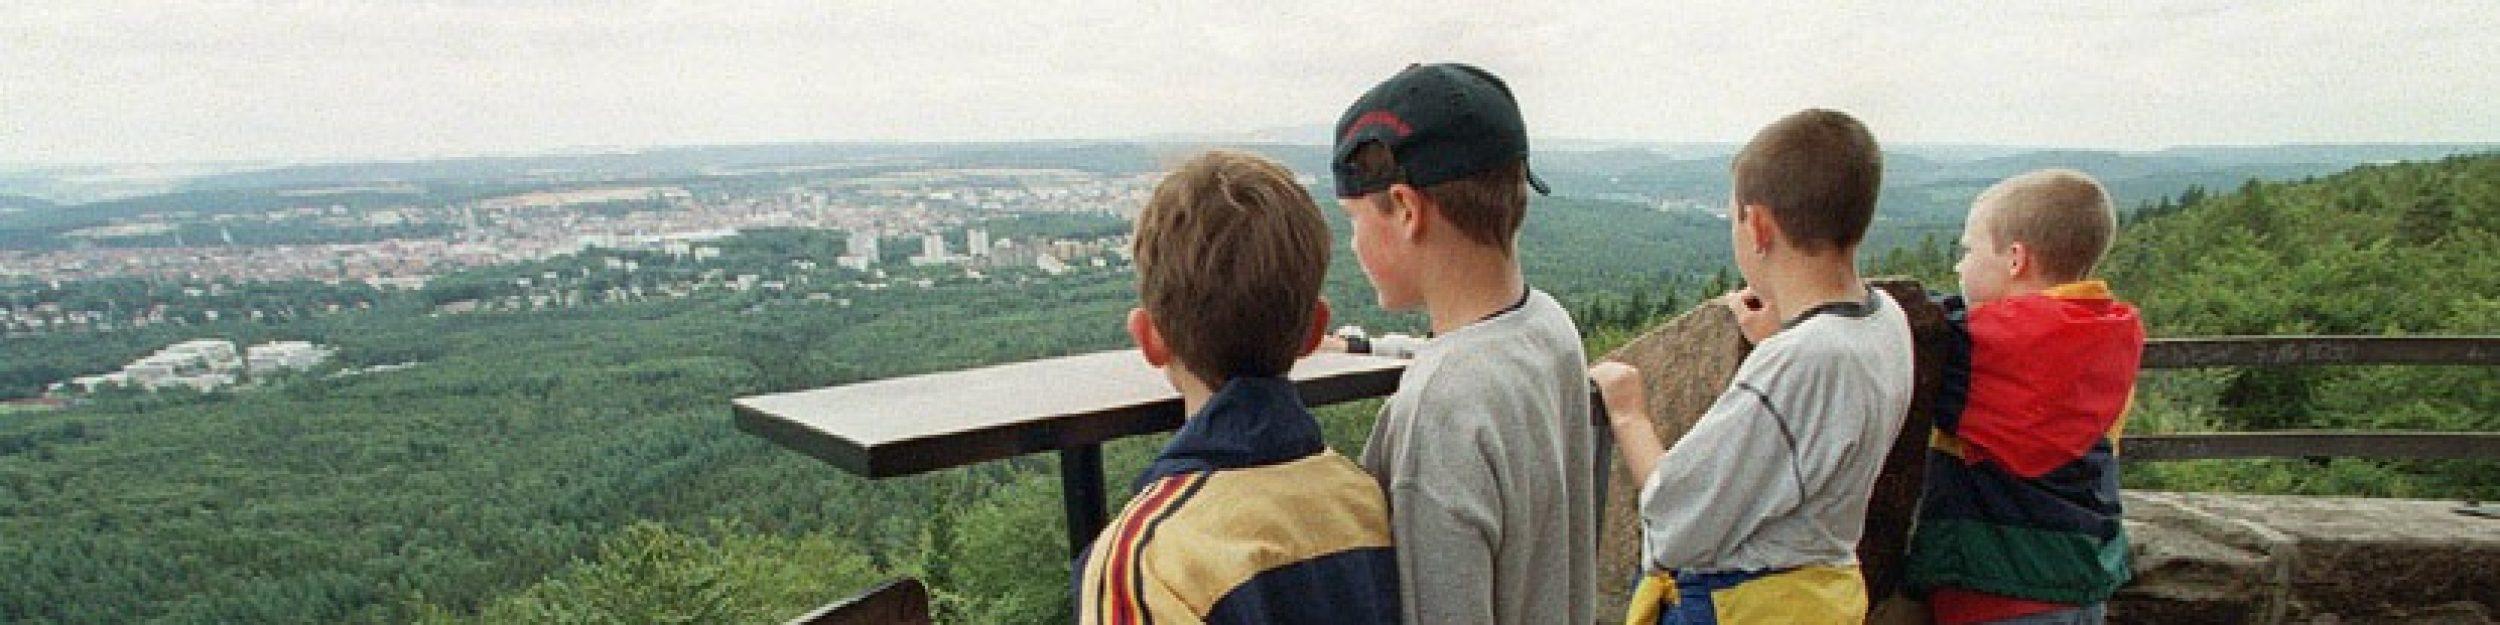 Humbergturm Kaiserslautern